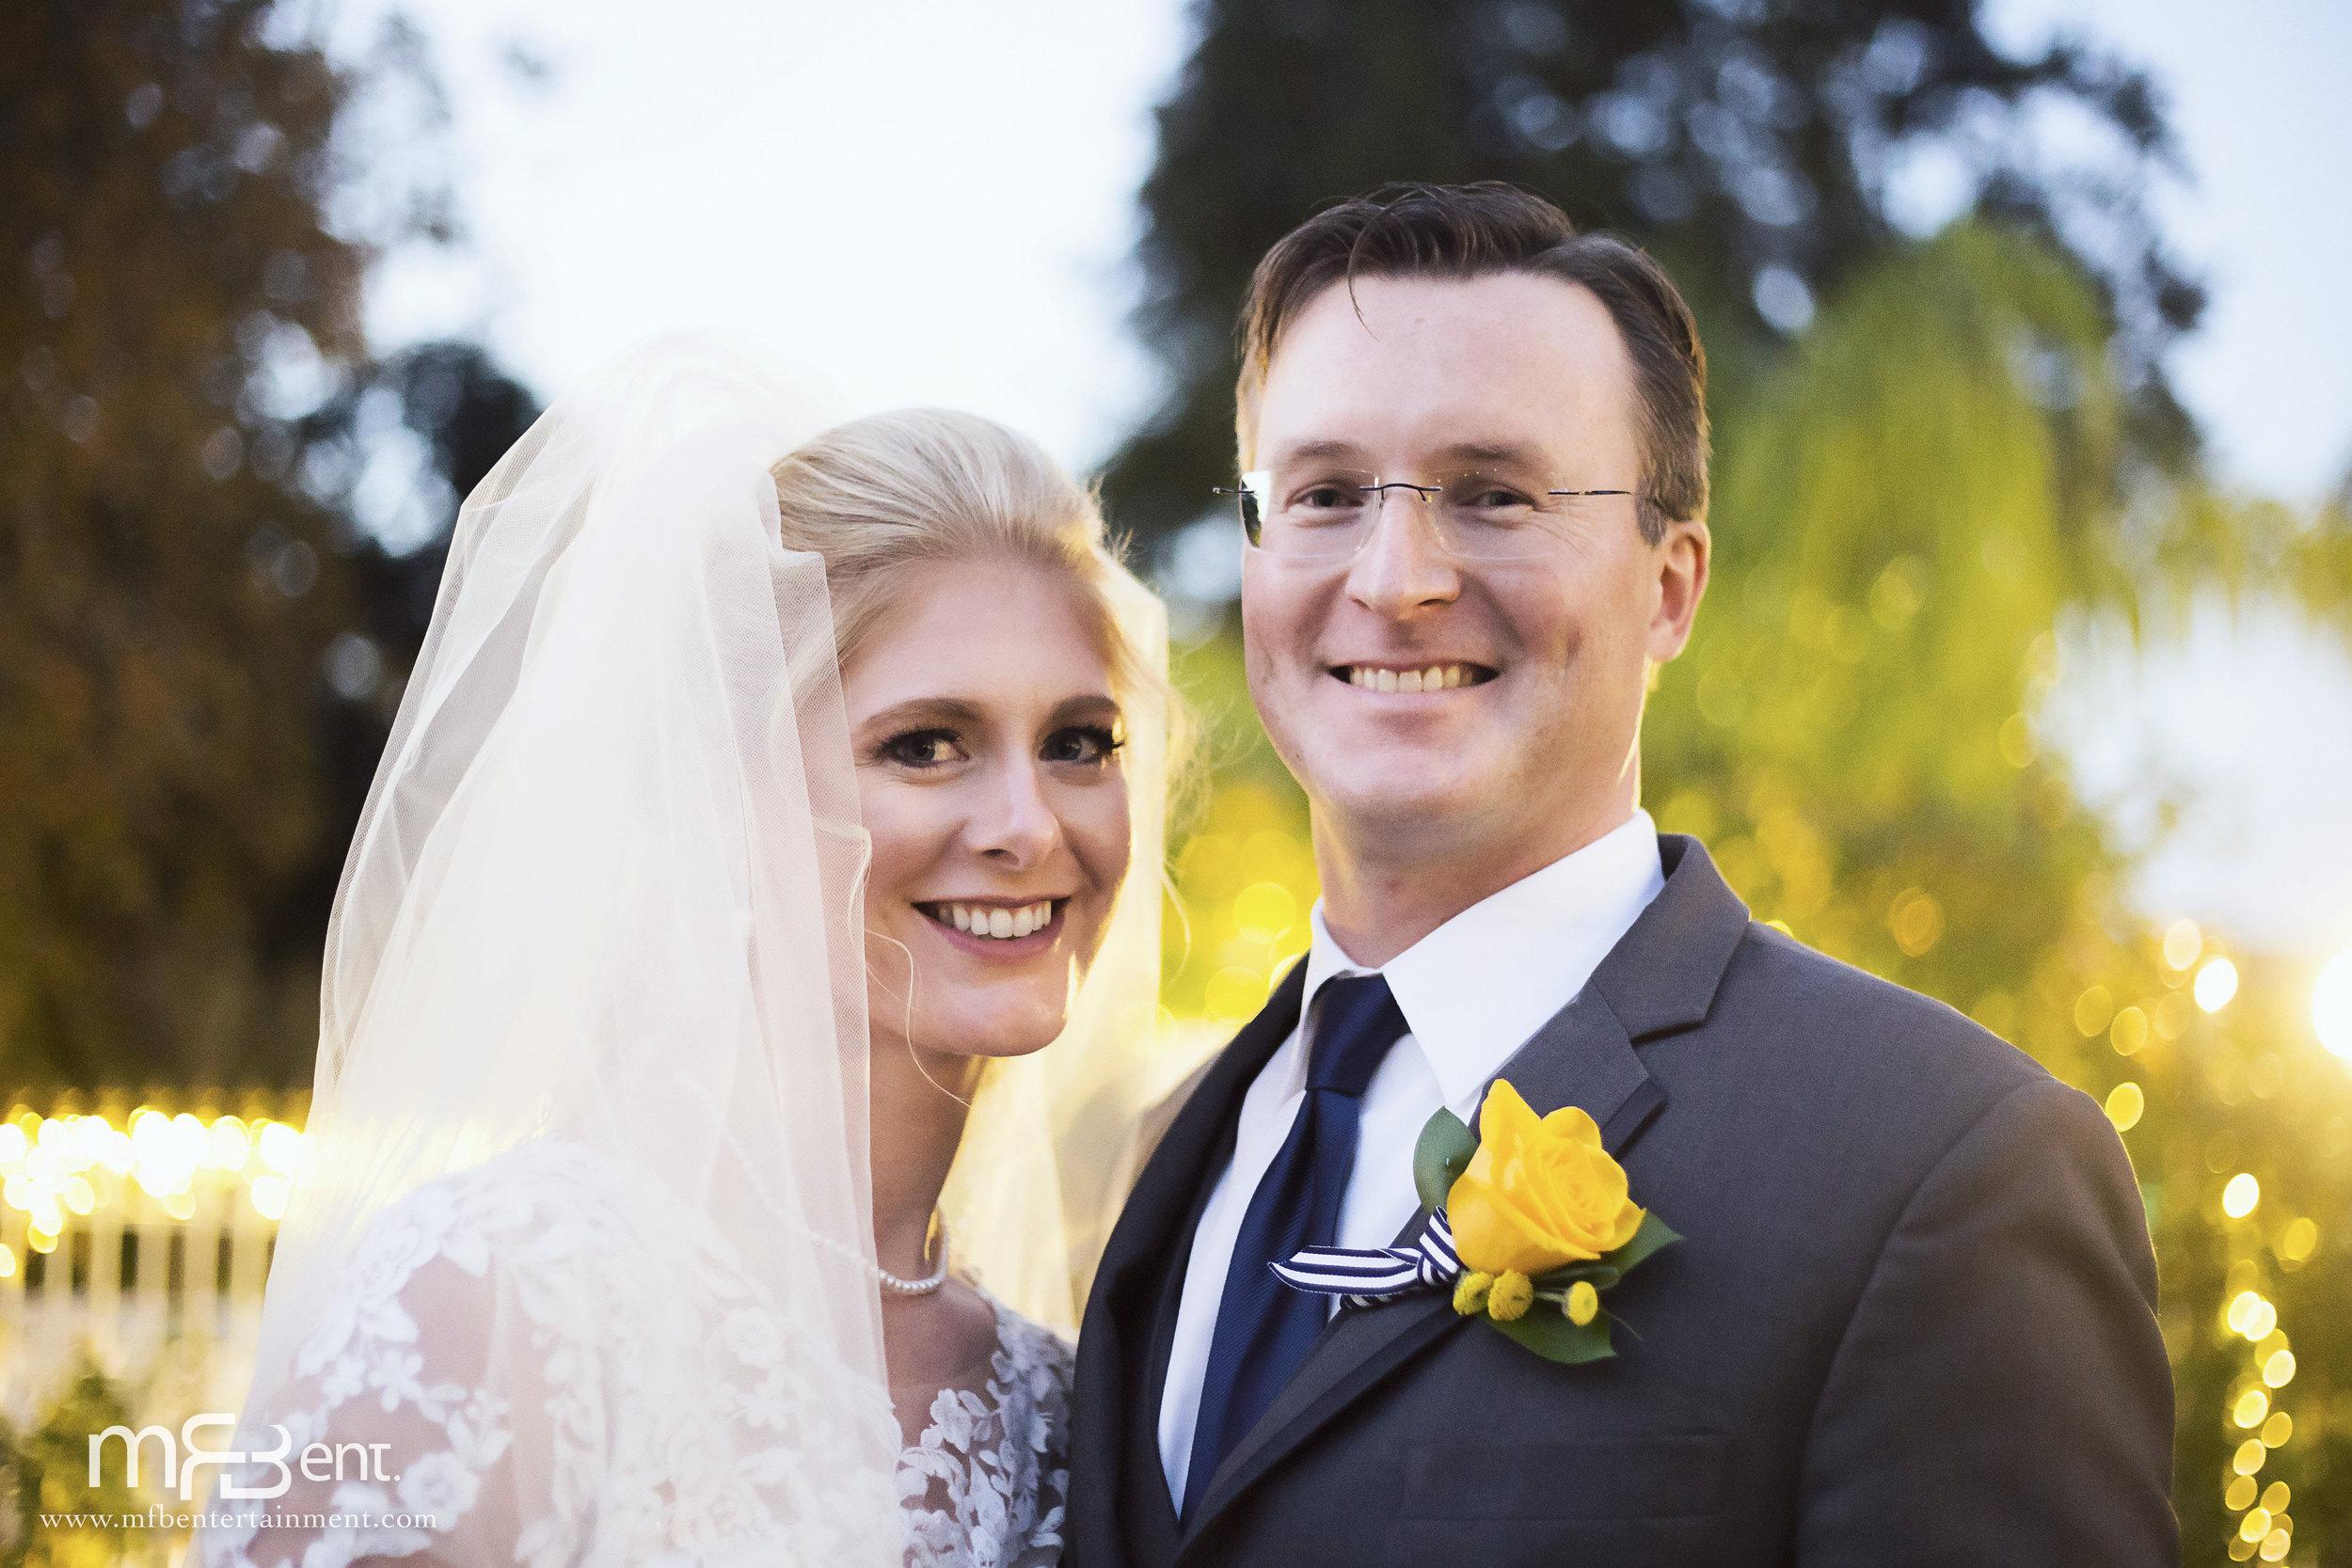 PIOTR CHELSEA WEDDING-PHOTO SESSION-0072 L.jpg